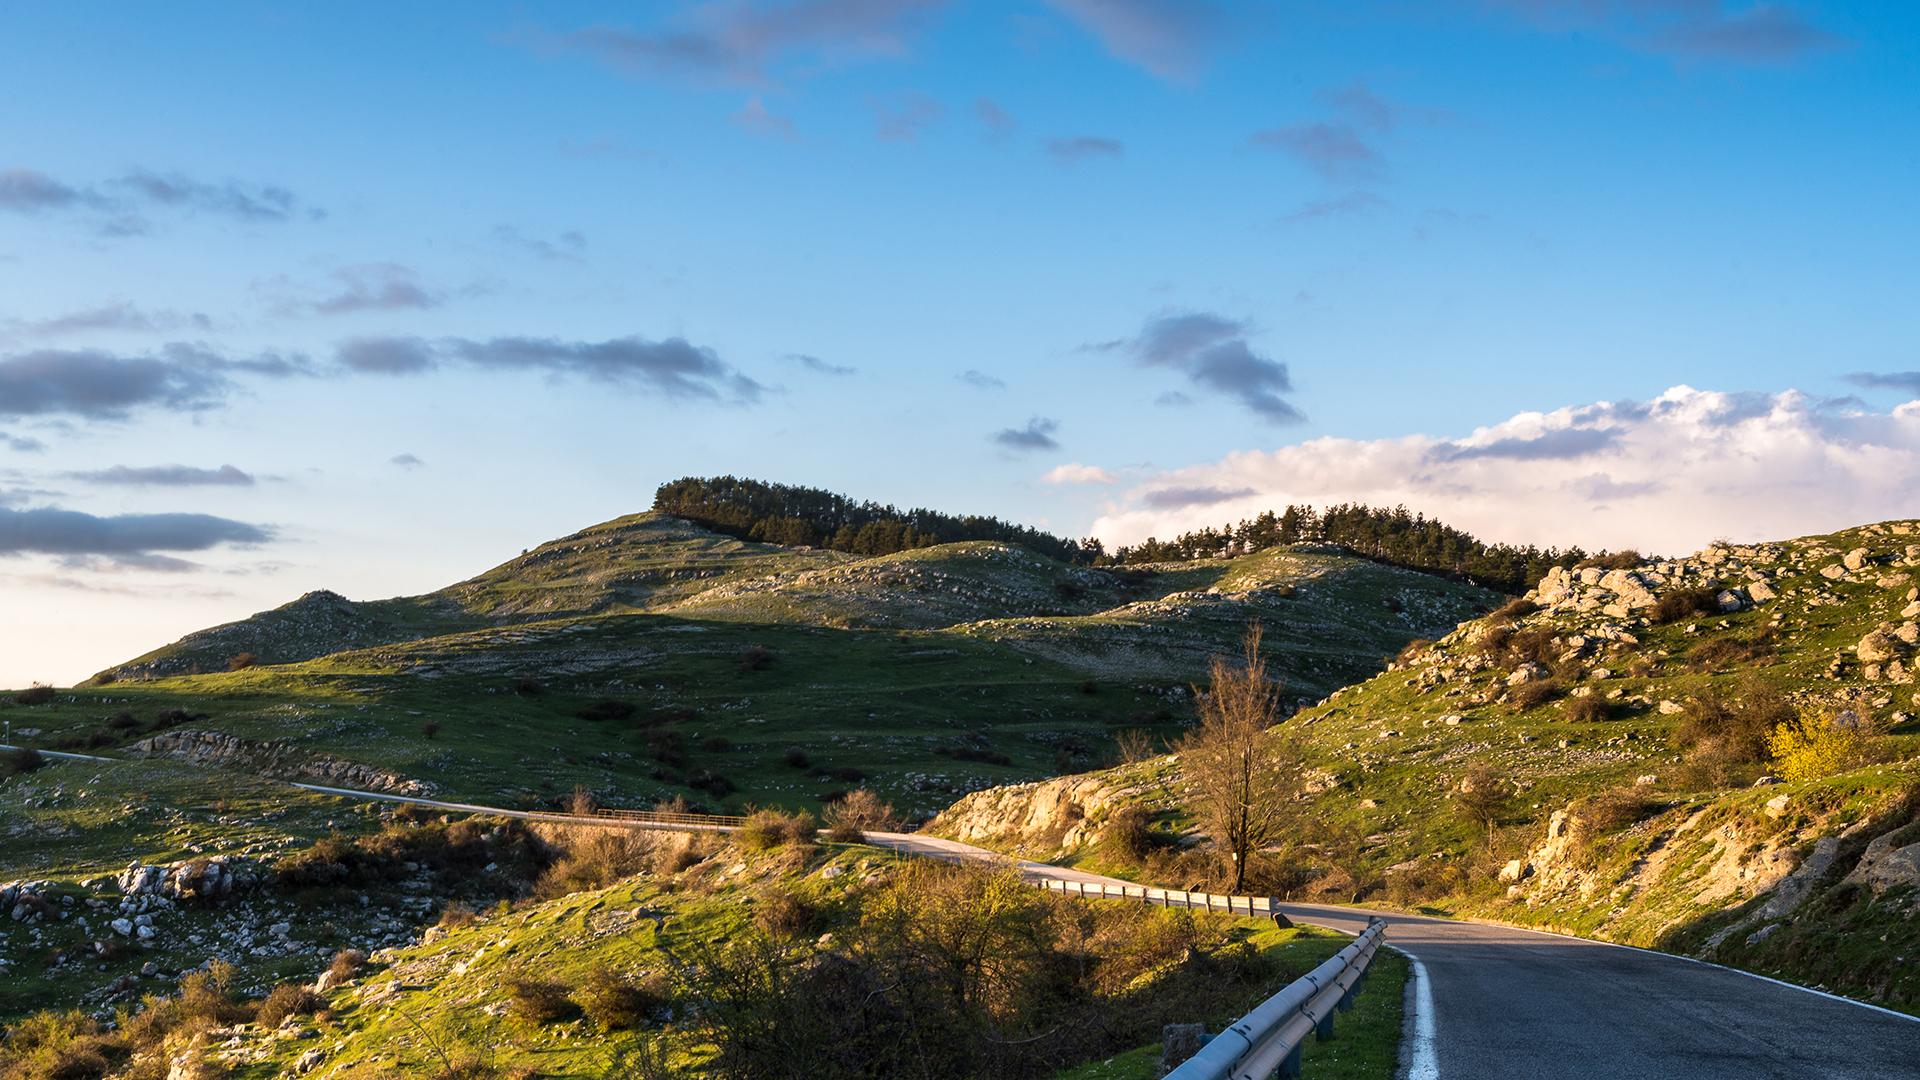 General 1920x1080 landscape mountains hills road nature sky sunlight rocks sky blue